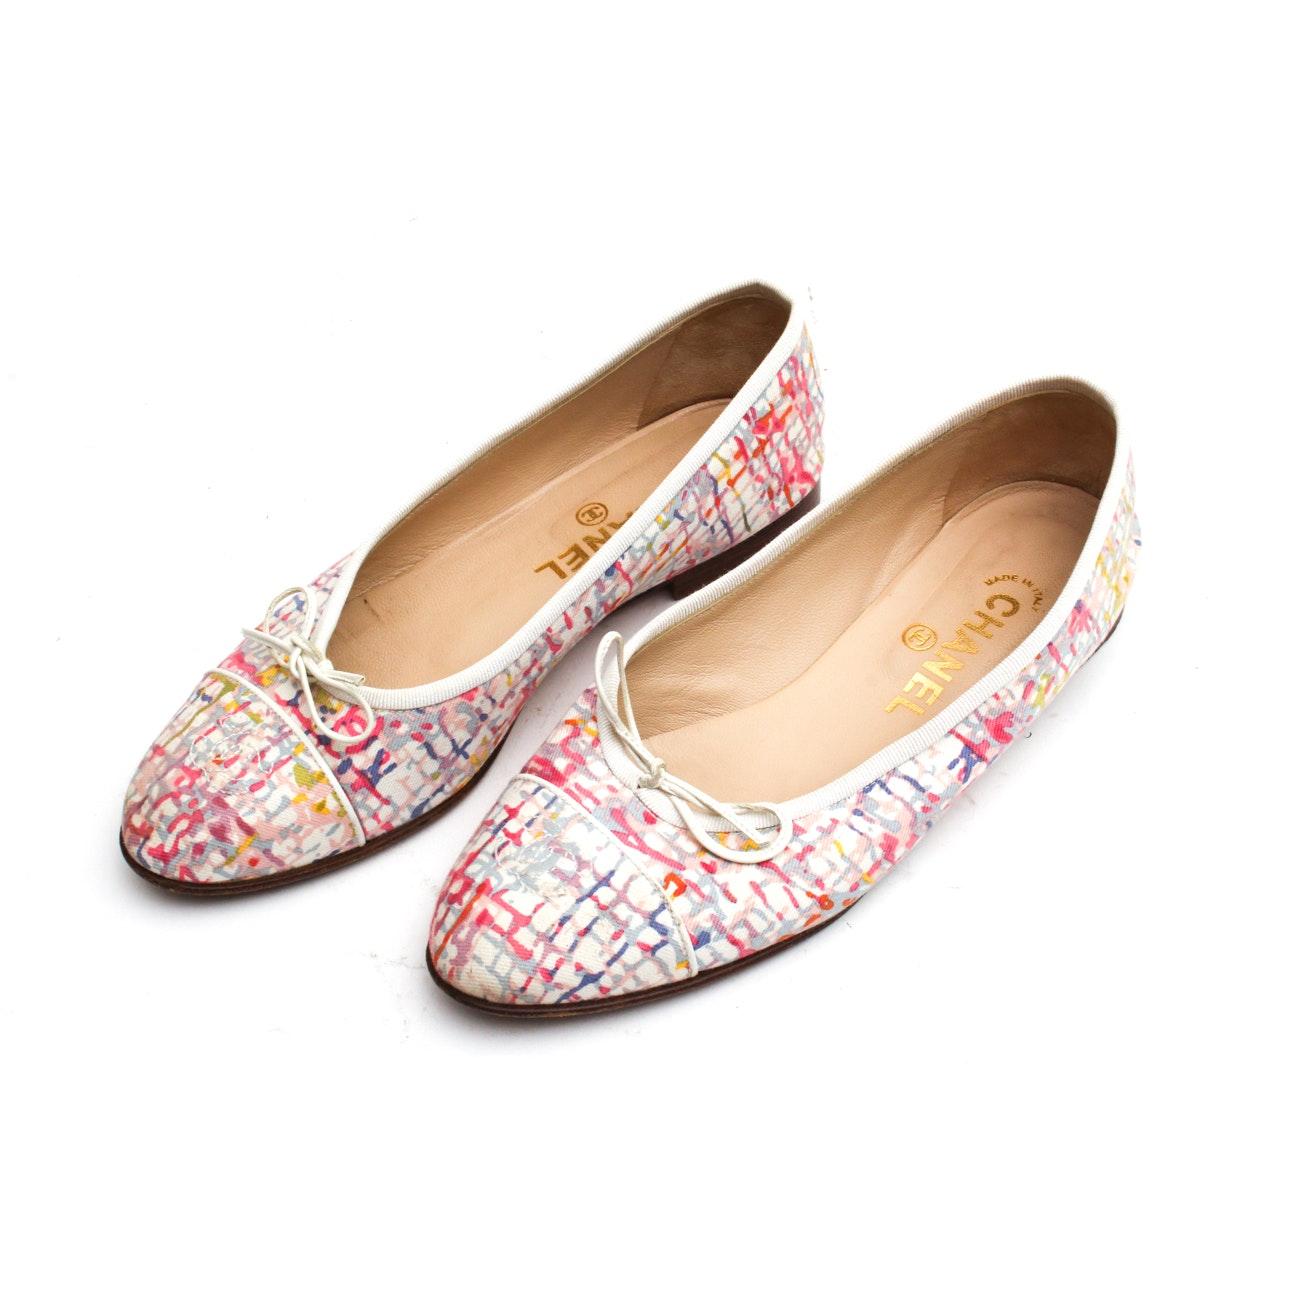 Chanel Multicolor Ballet Flats